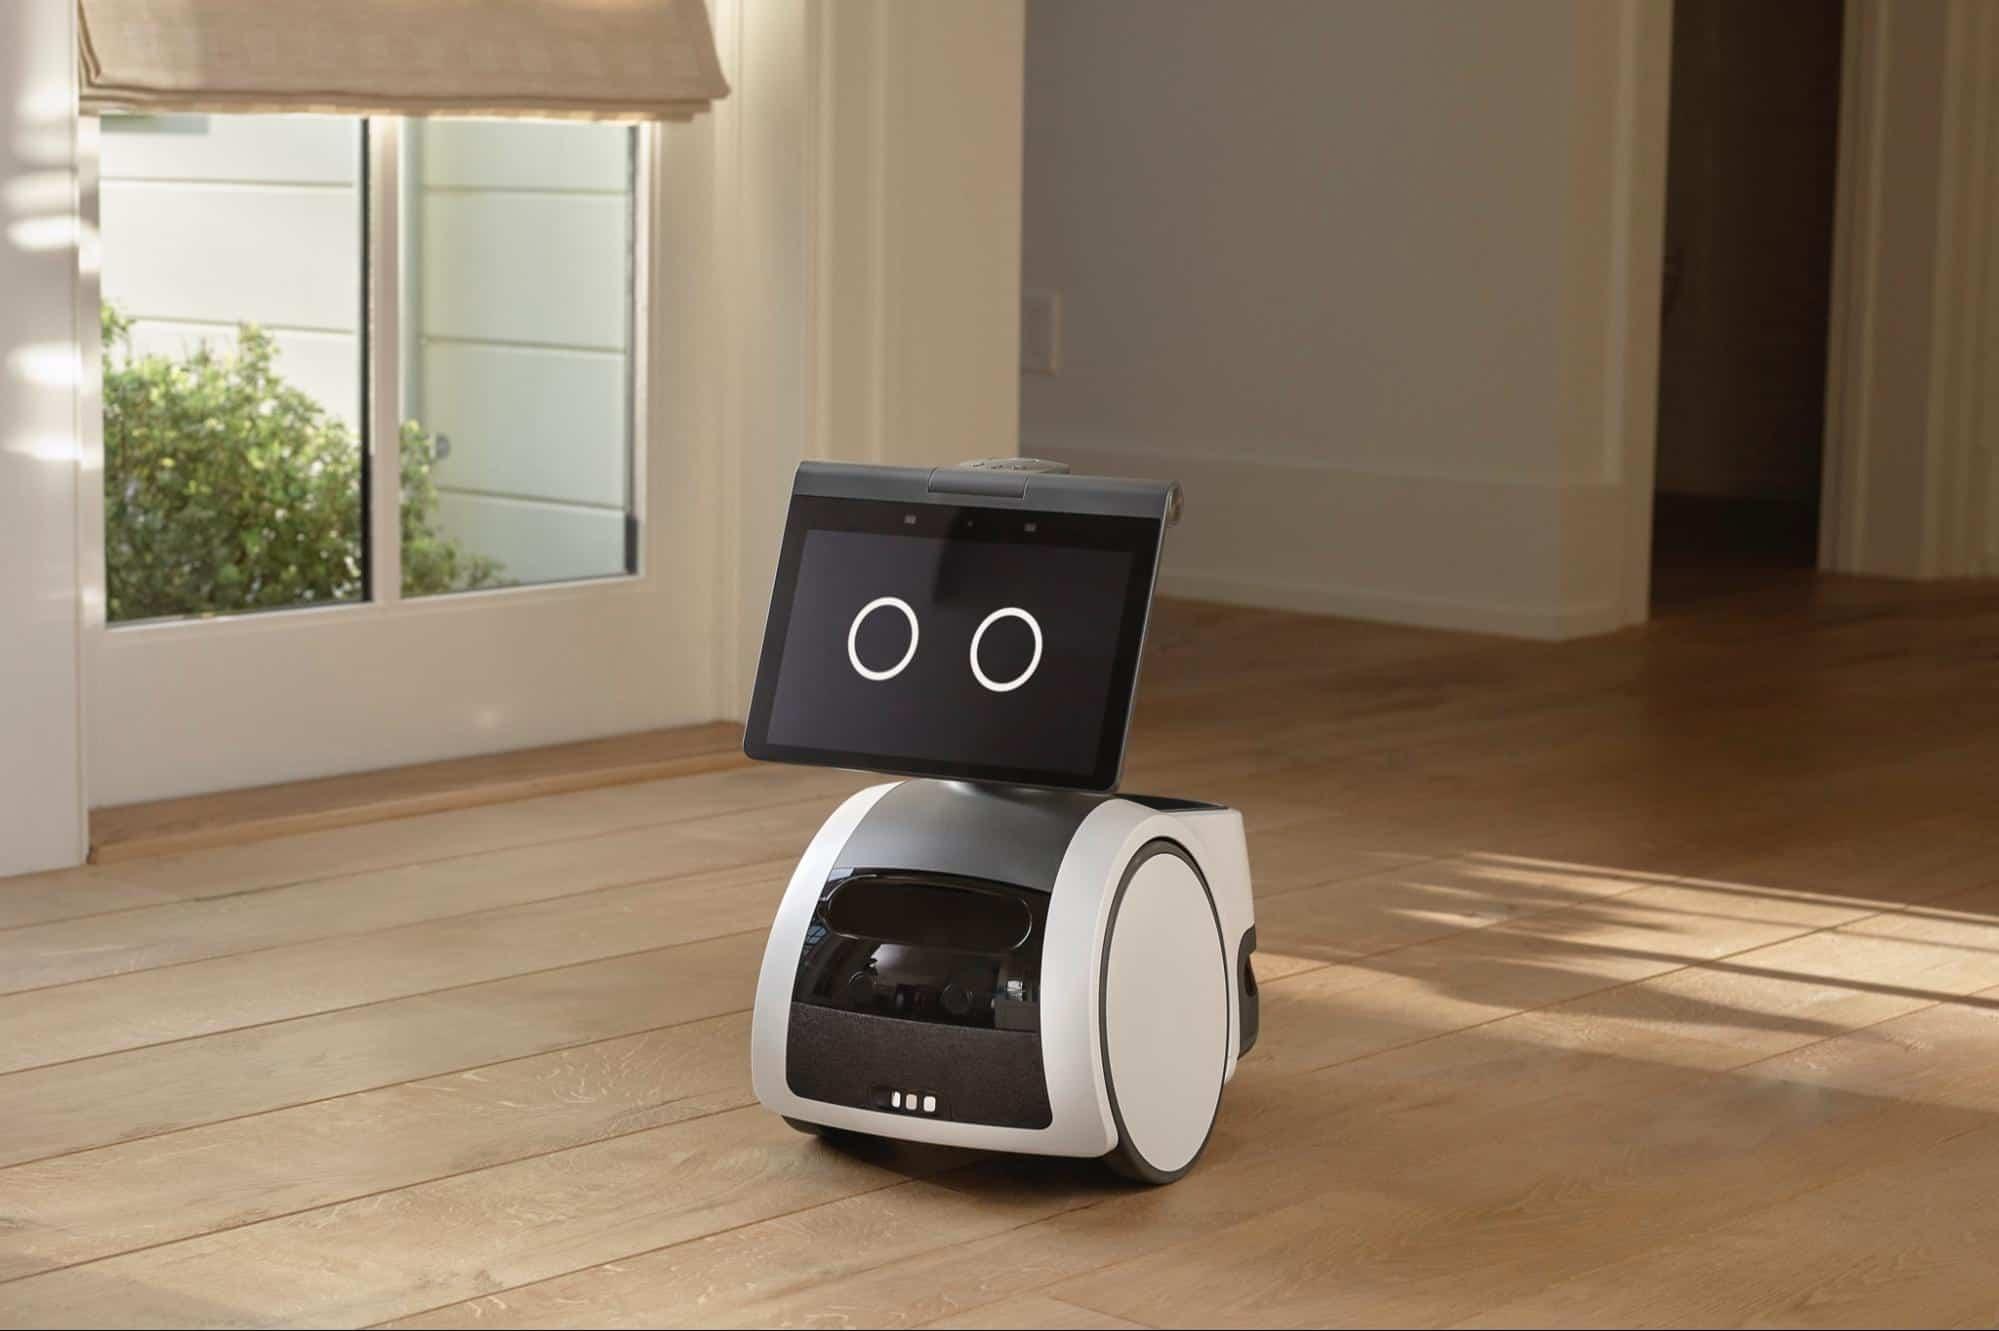 Astro Home Robot (Photo: Amazon)